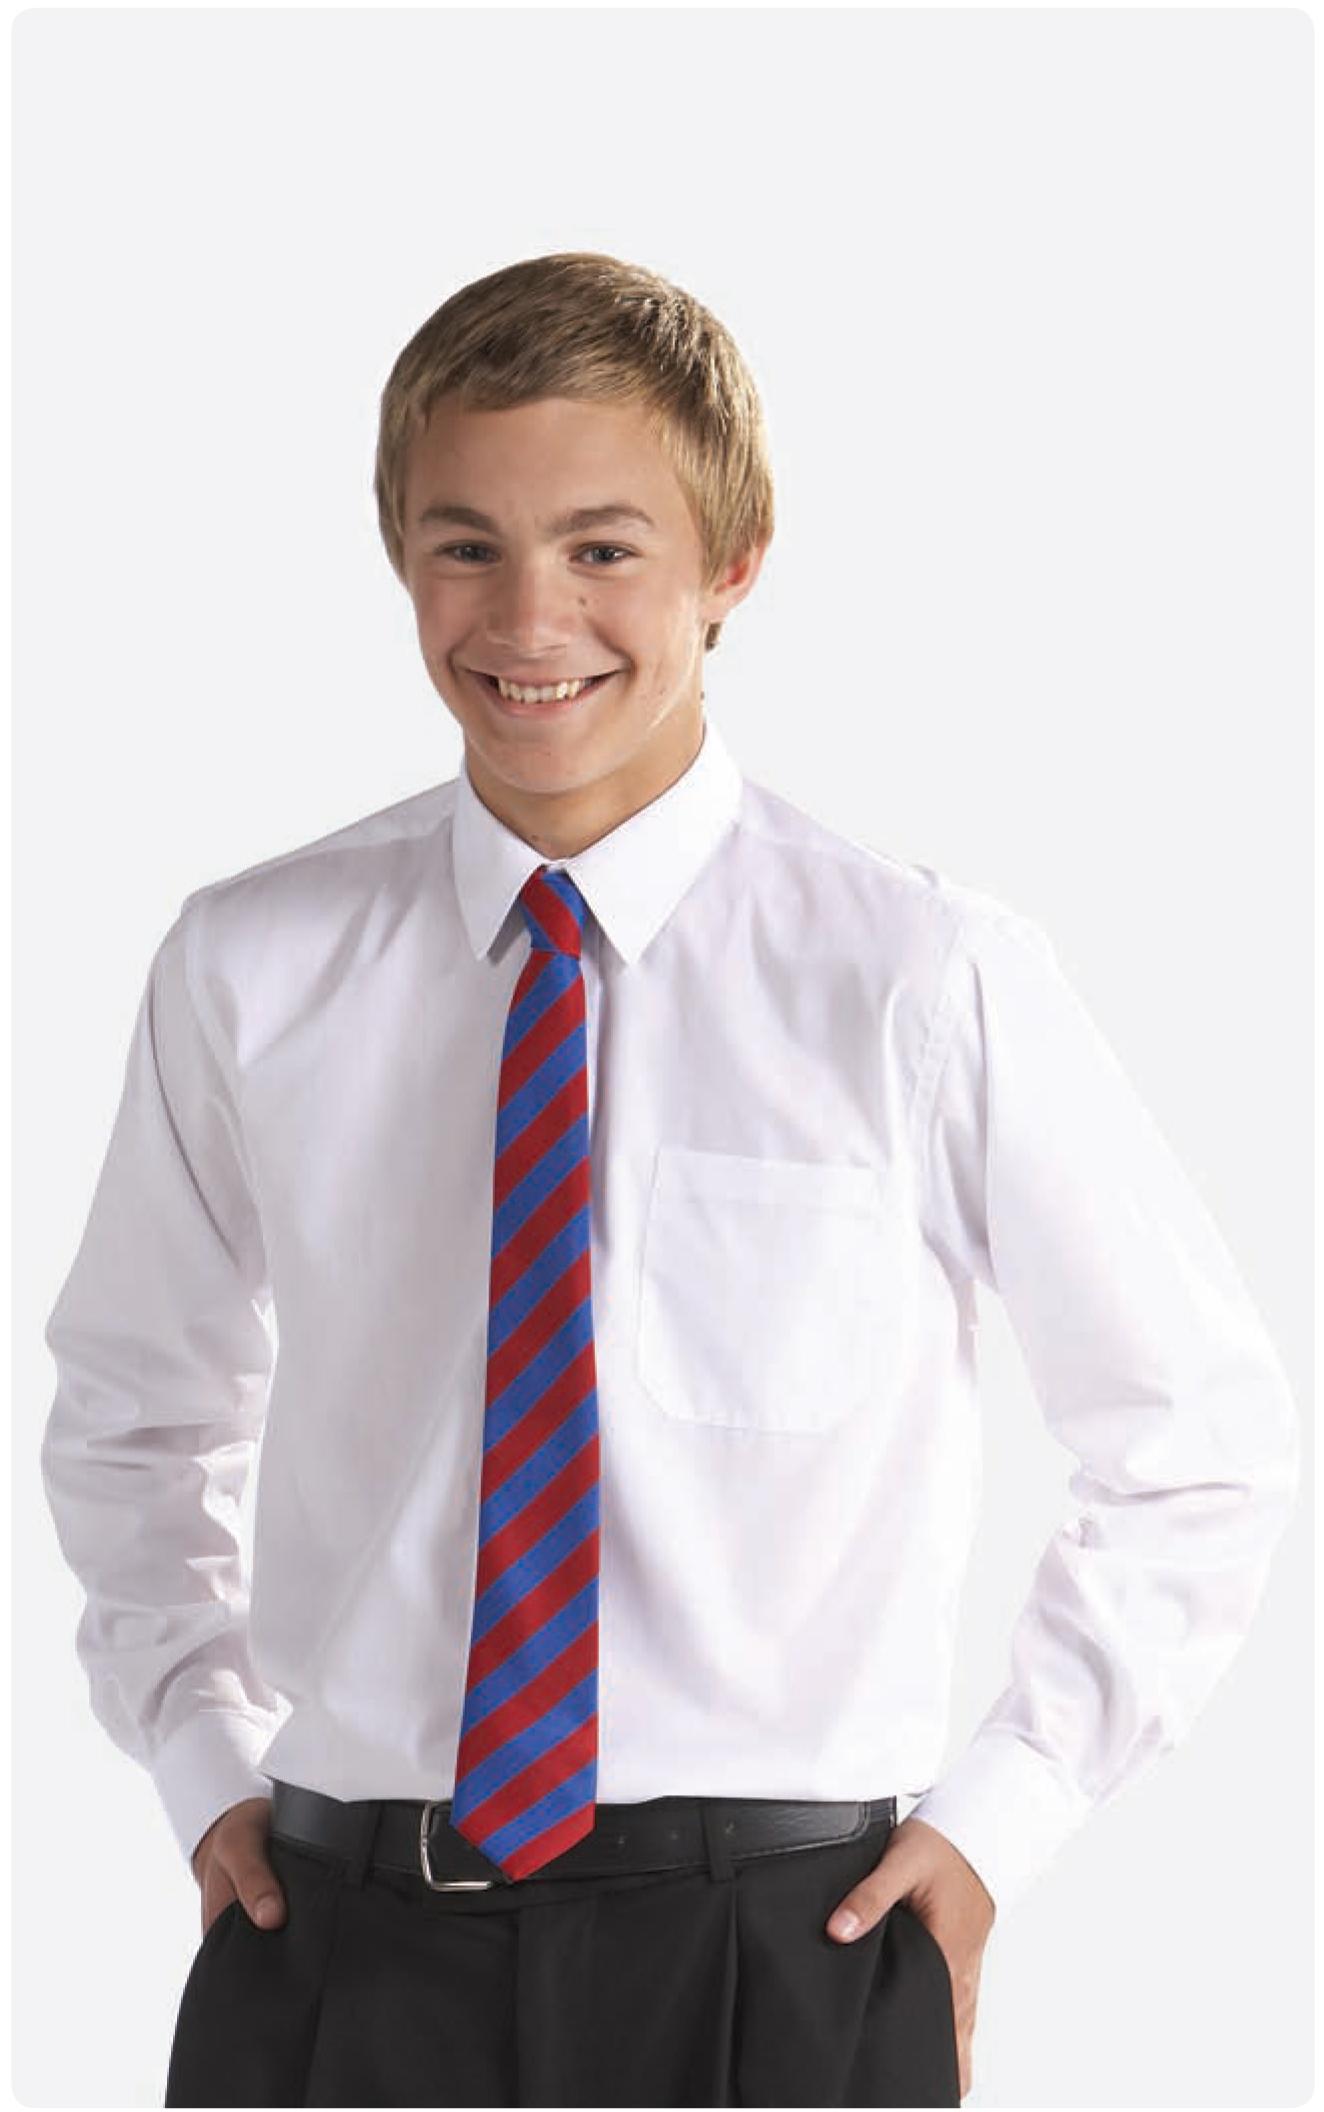 26c88695284 Рубашки для мальчиков в школу (34 фото)  белые